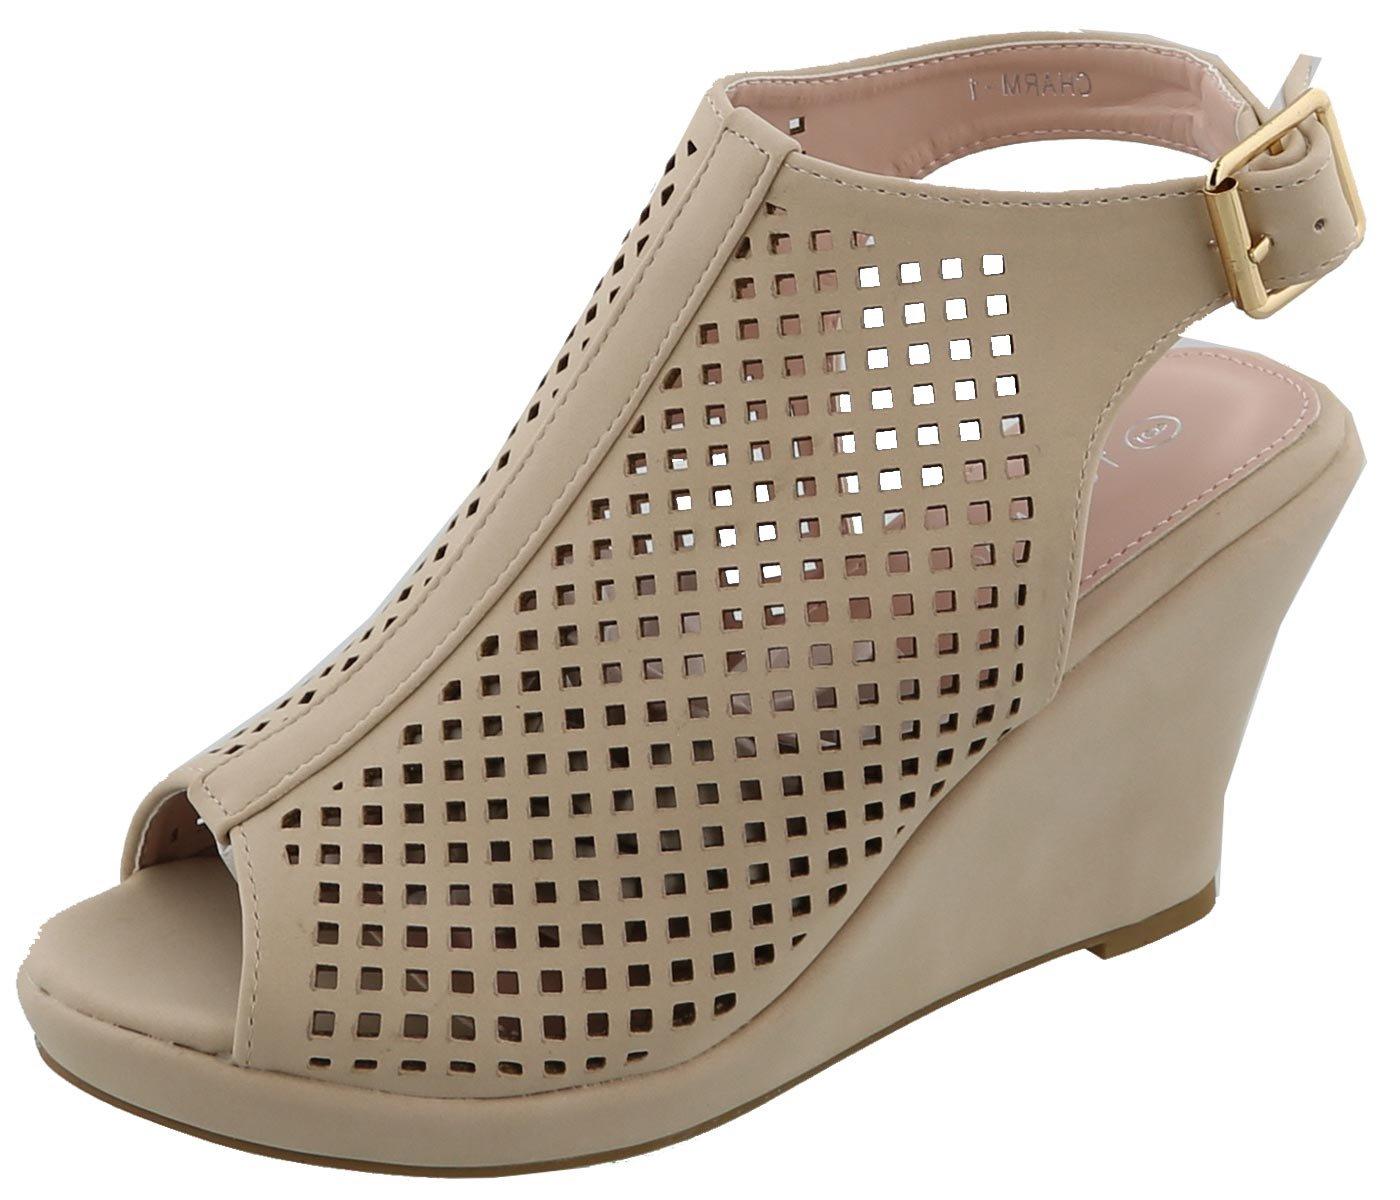 Top Moda Women's Laser Cut Slingback Peep Toe Wedge Bootie Sandal (7 B(M) US, Blush)